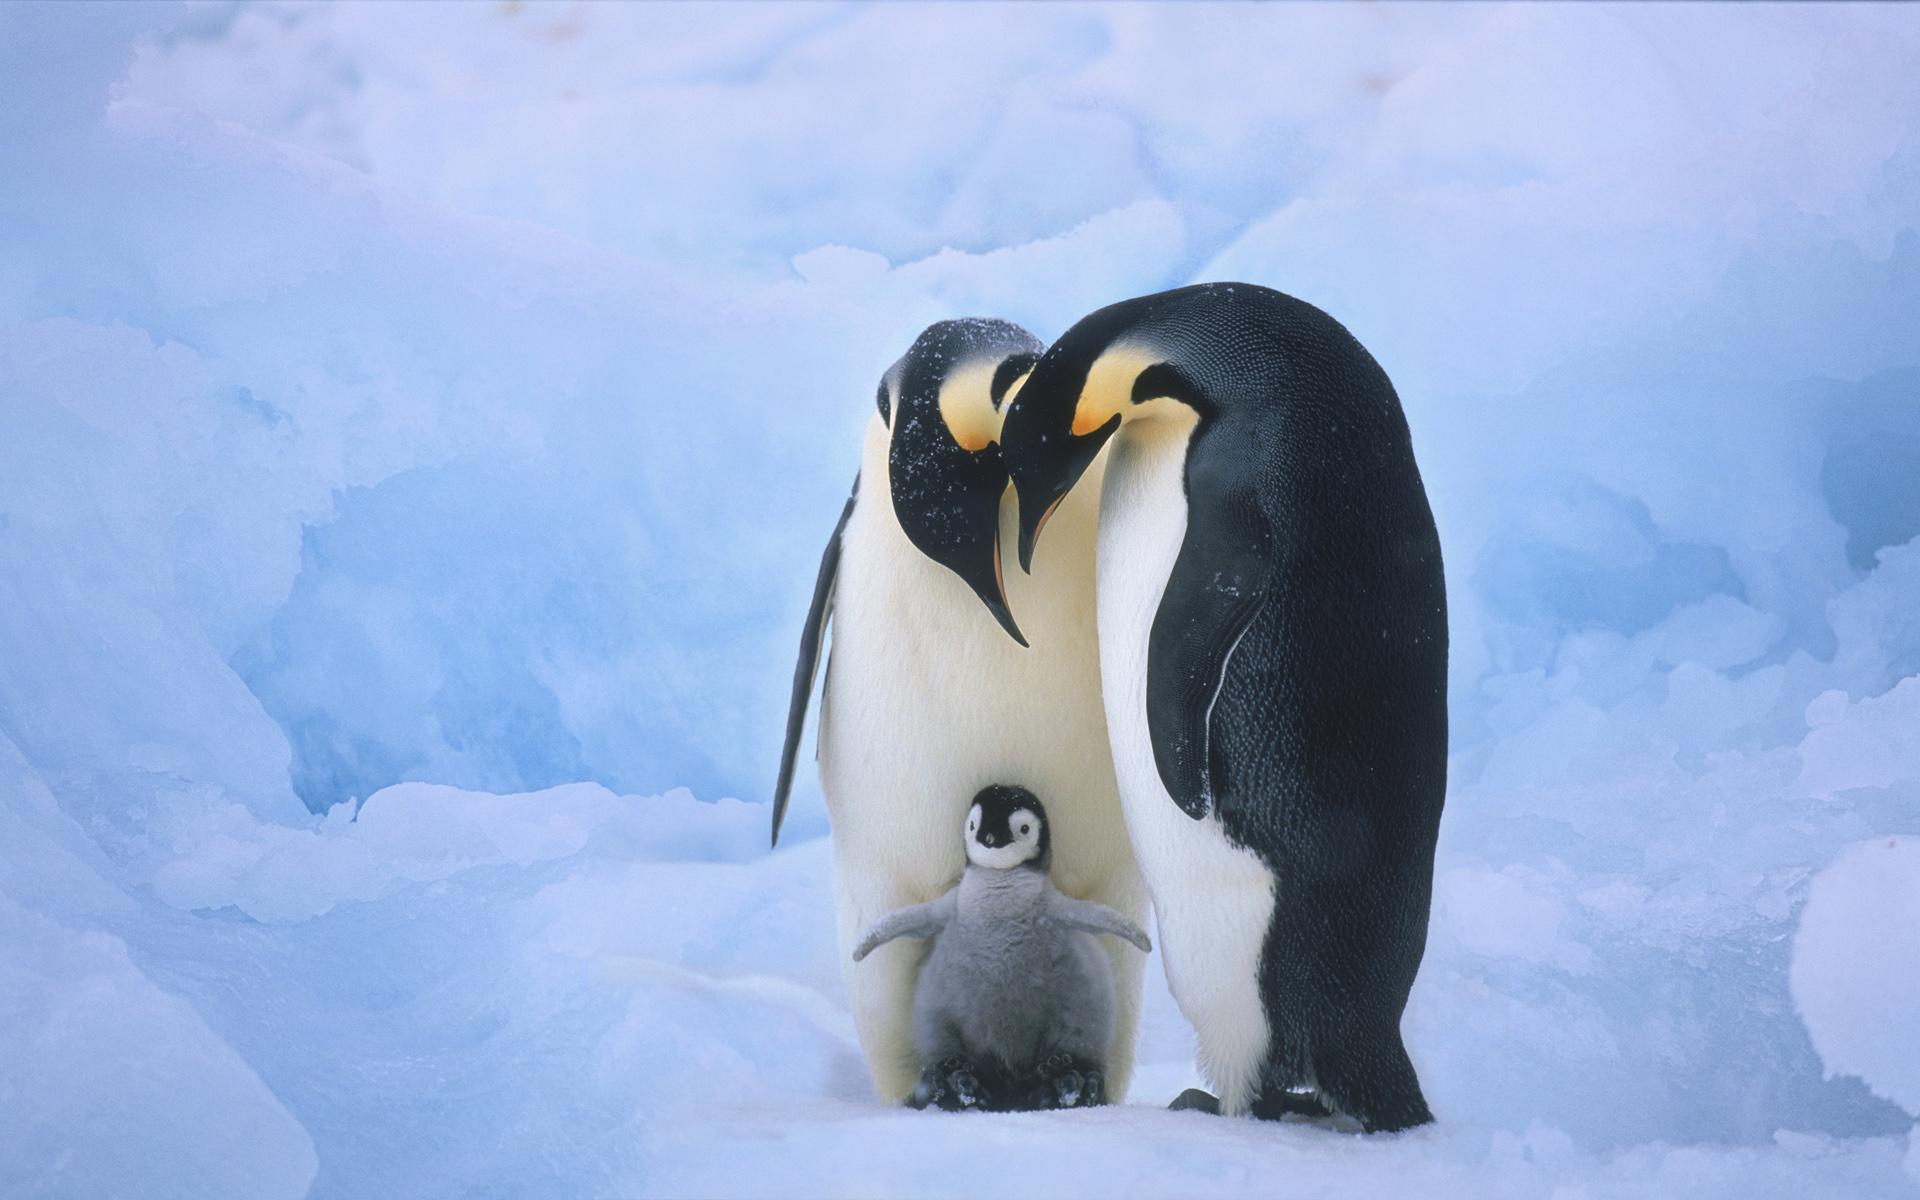 Cute penguin - photo#19